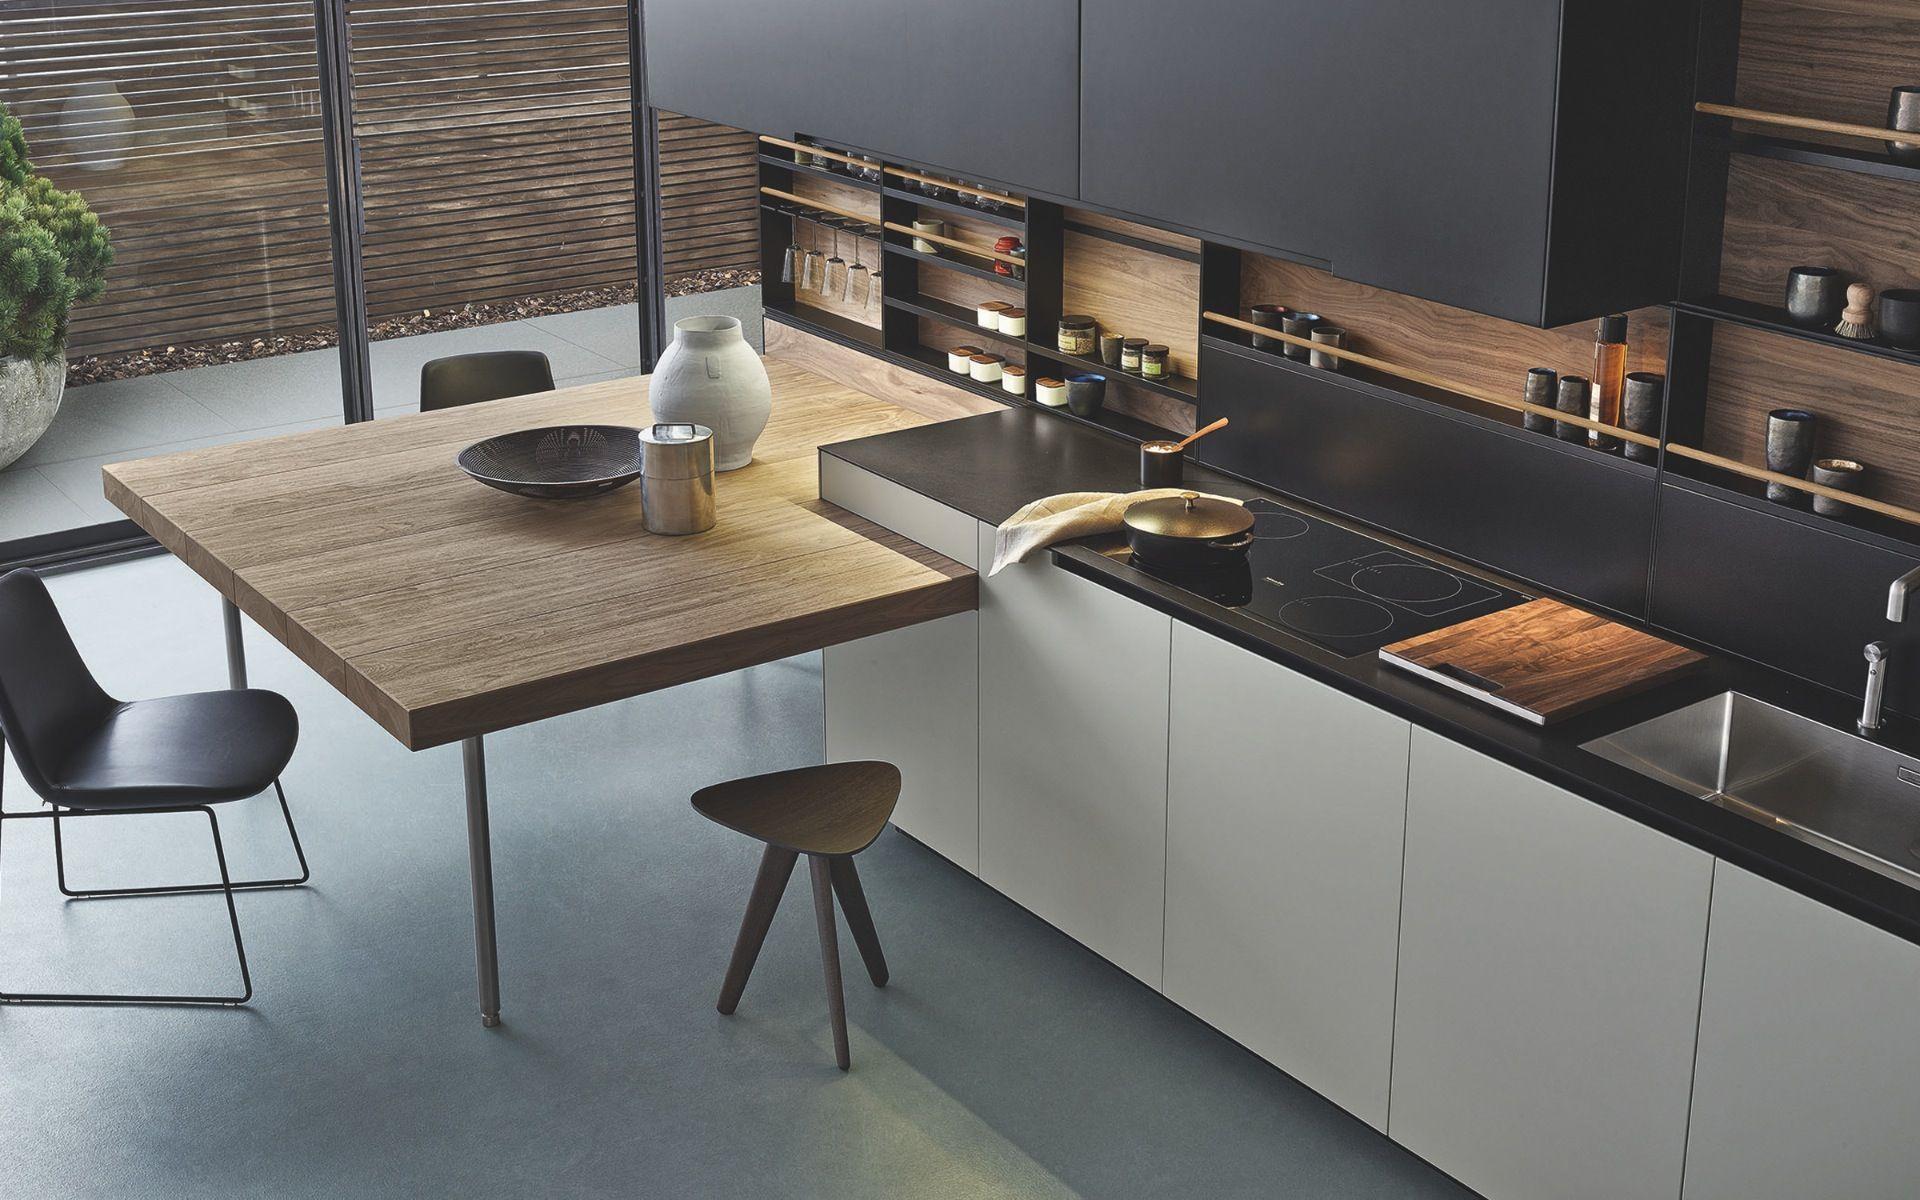 Varenna Küchen ~ Bagno sasso mobili u2013 varenna küchen home design pinterest php